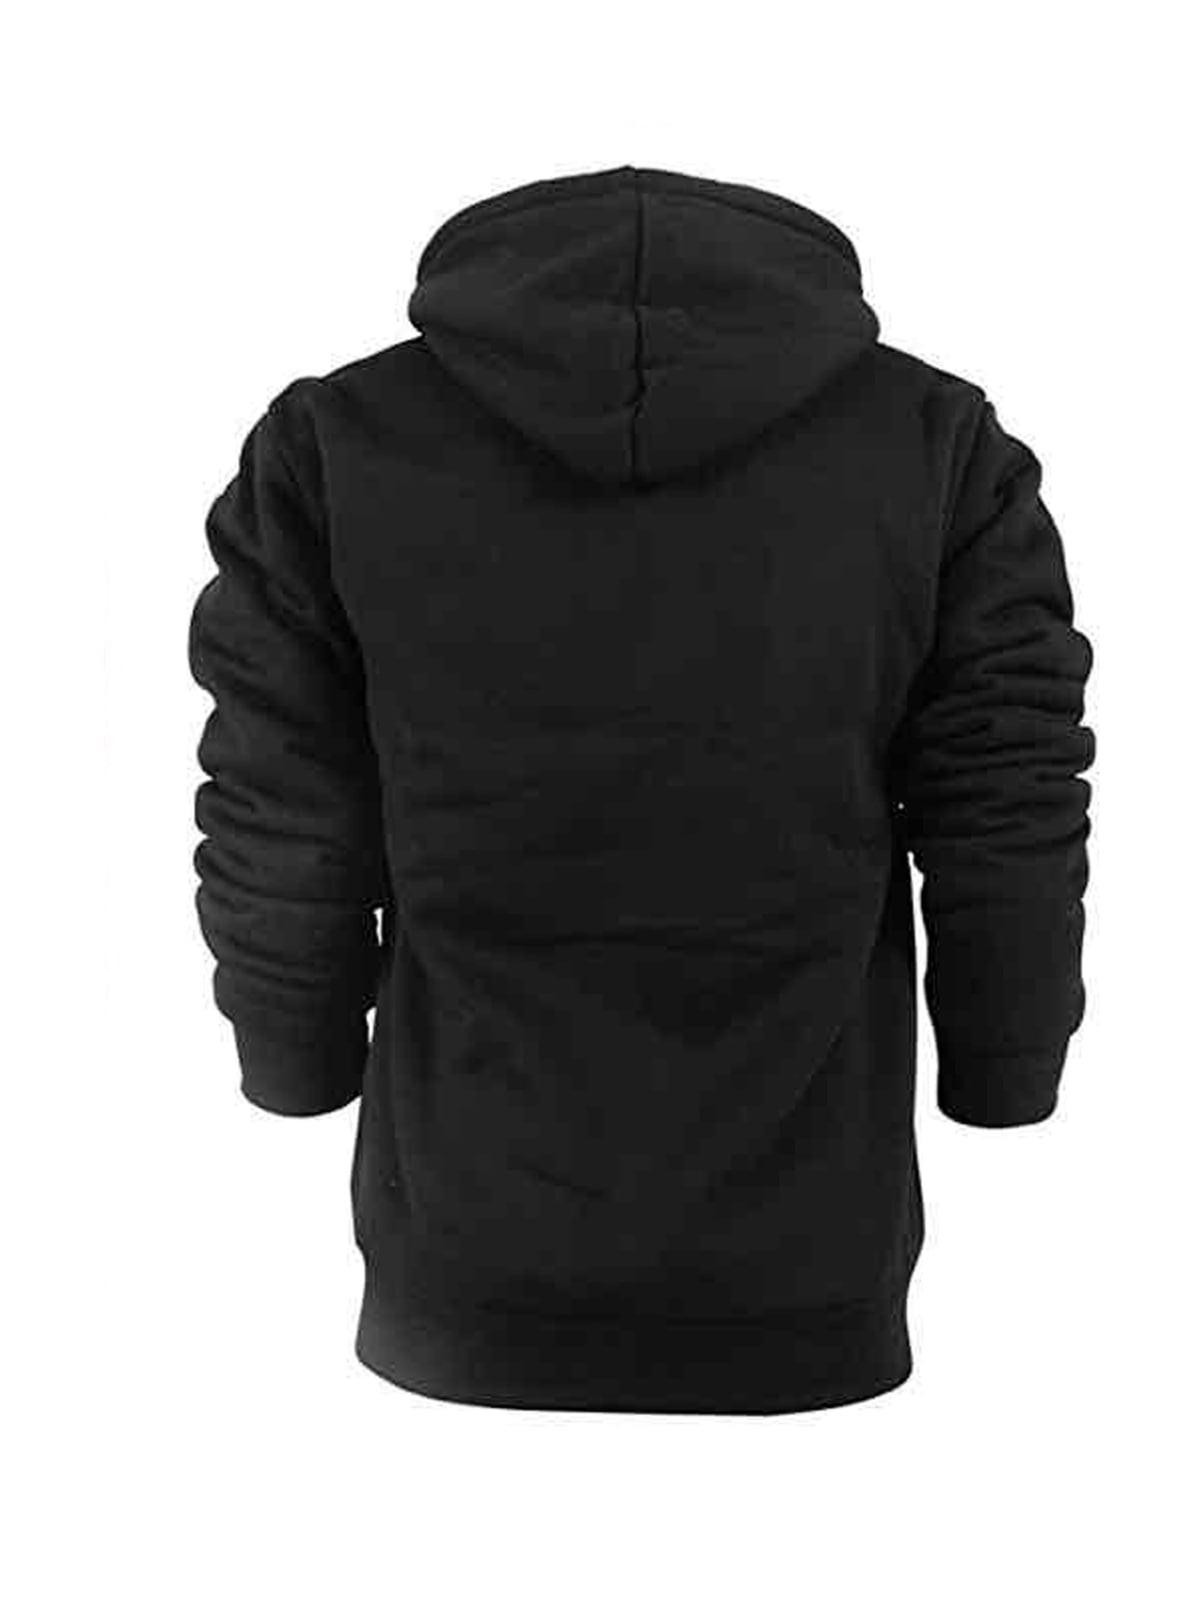 Casual Sherpa Lined Winter Kids Coat Activewear Size 8-16 LeeHanTon Boys Thick Zip Up Hoodie